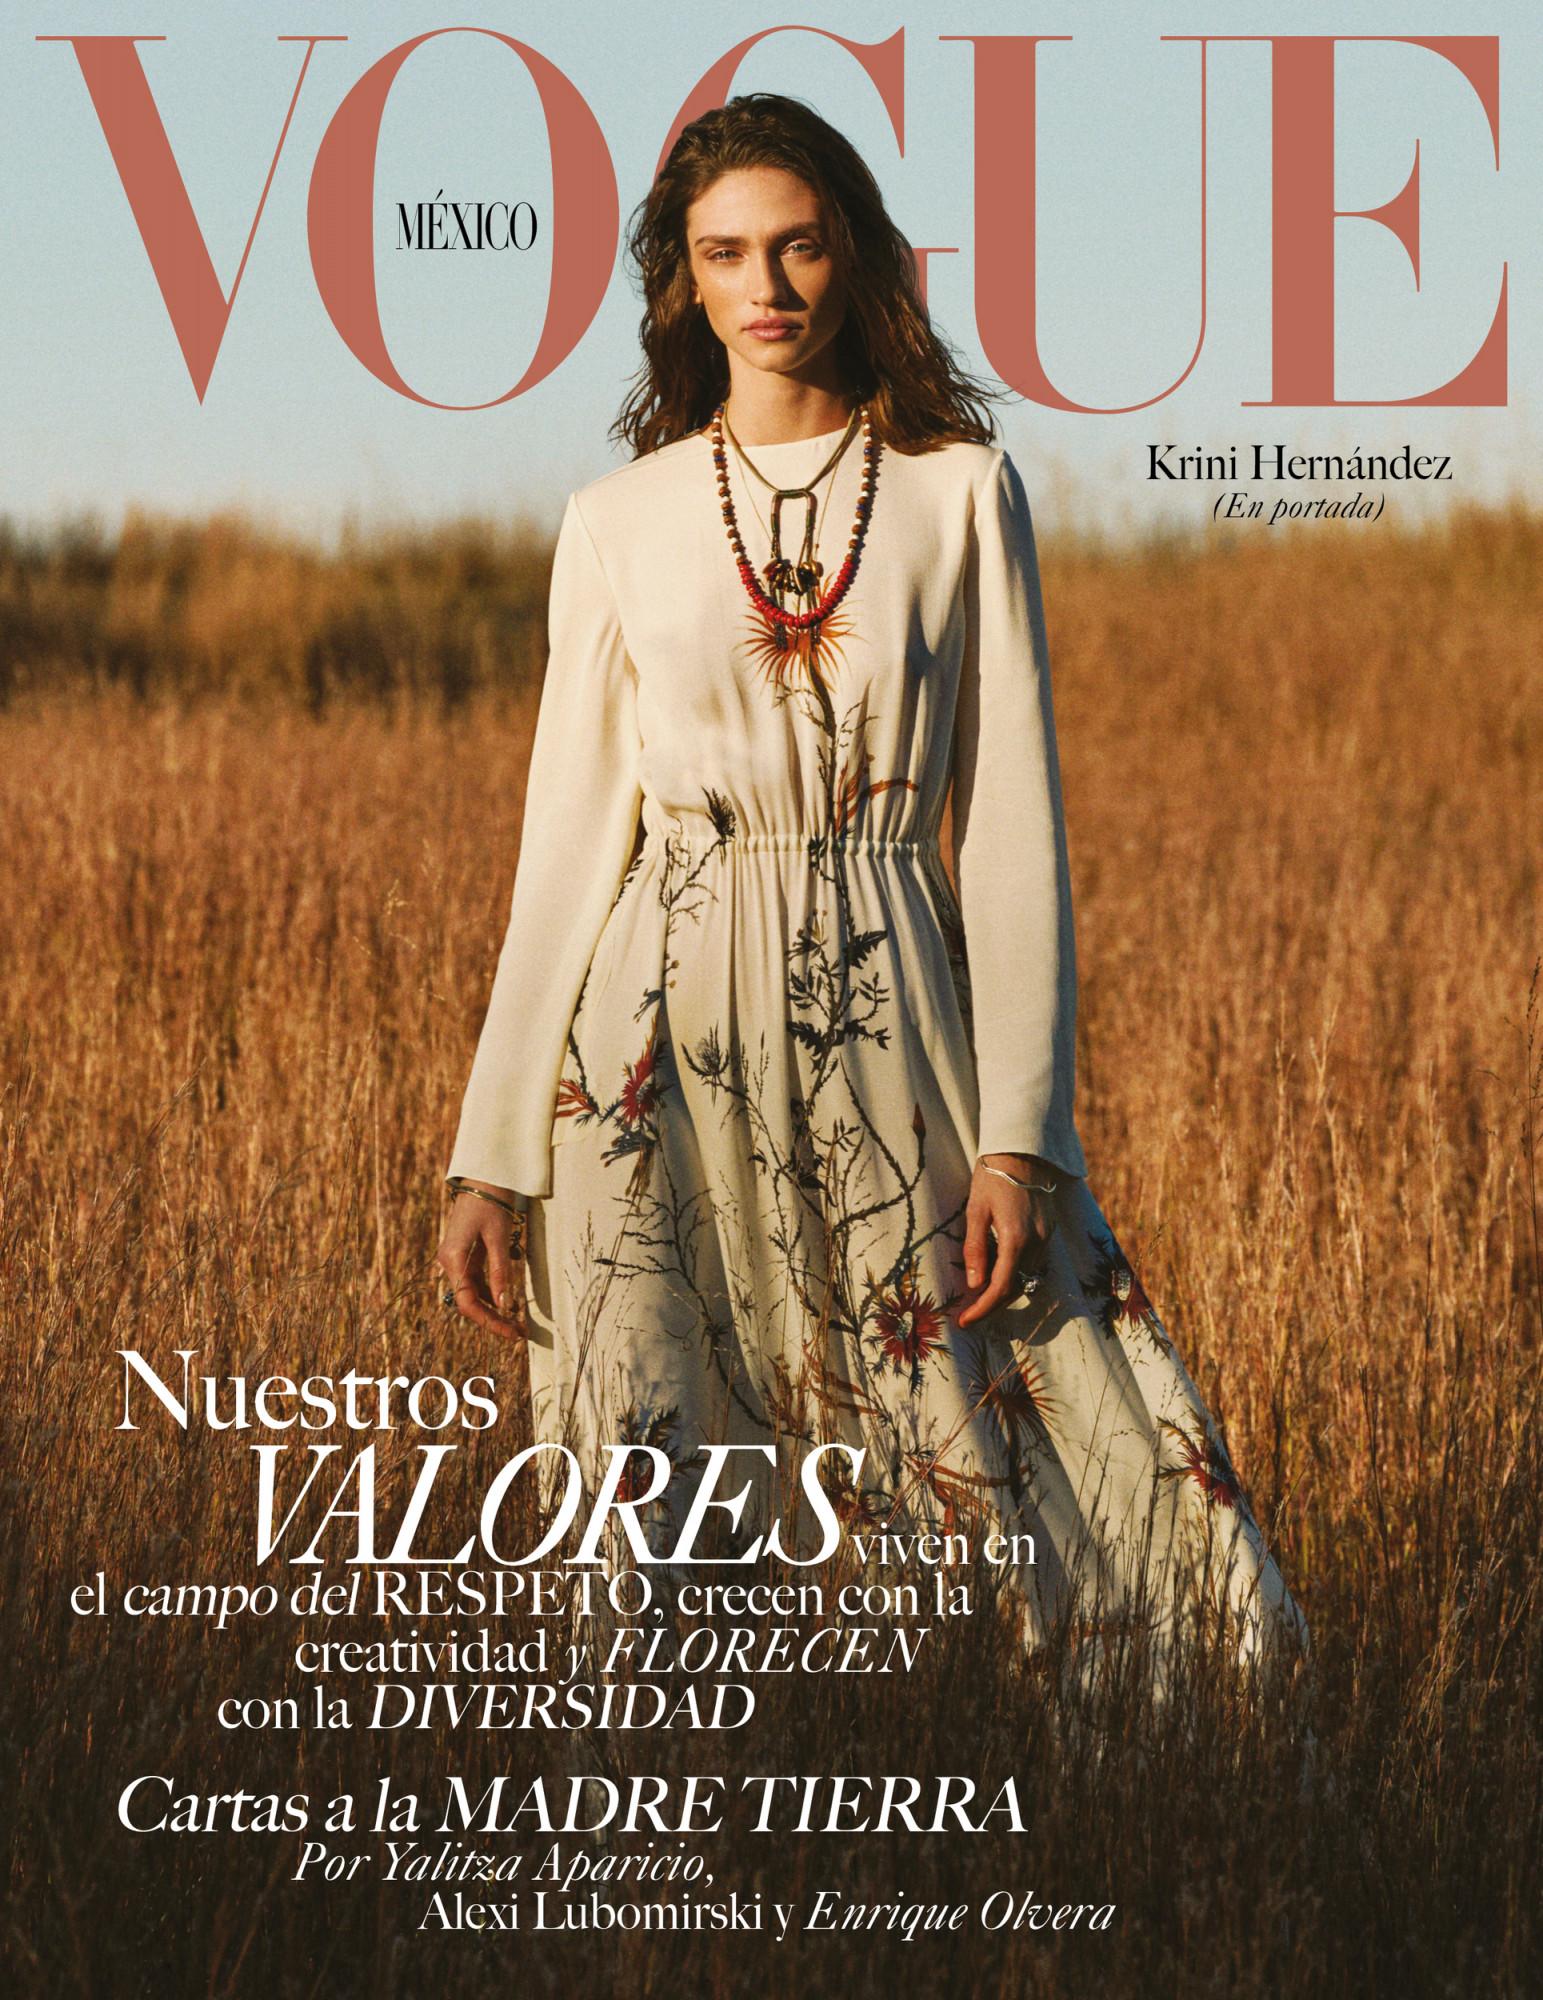 Bjorn Iooss Vogue Mexico - Krini Alejandra